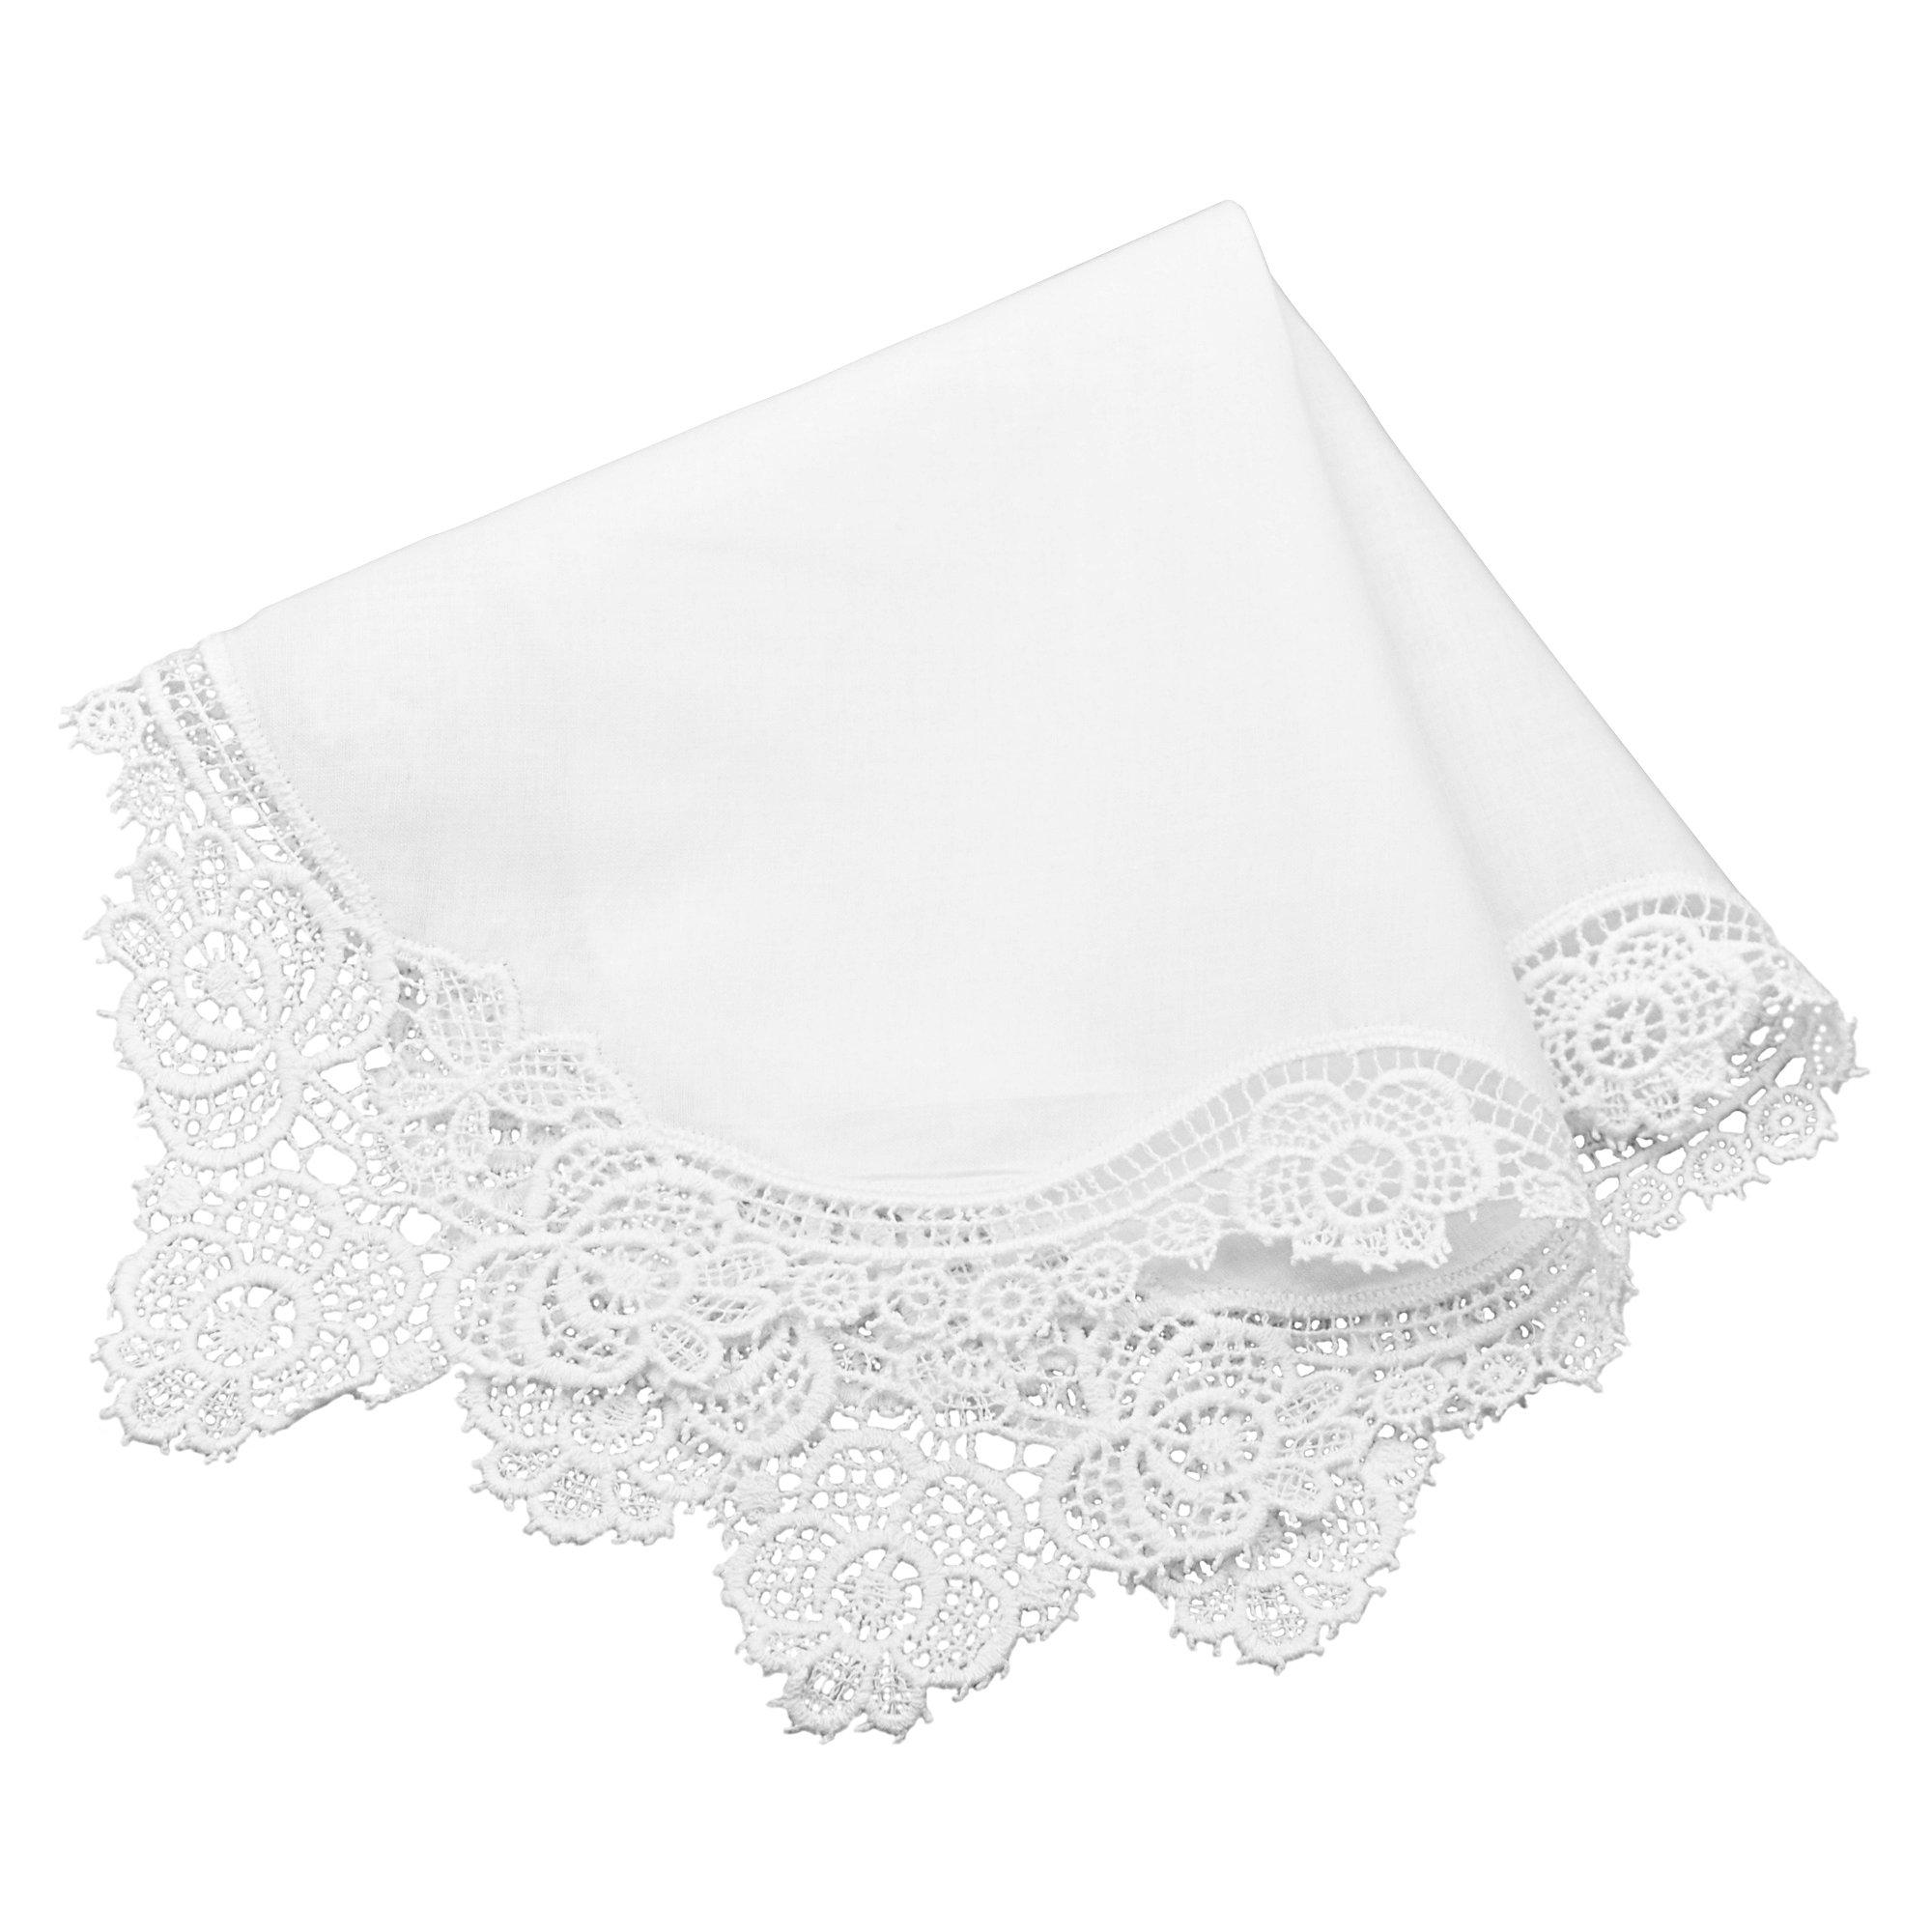 Milesky Bridal Wedding Crochet Lace Handkerchief Premium 60S Cotton CH02